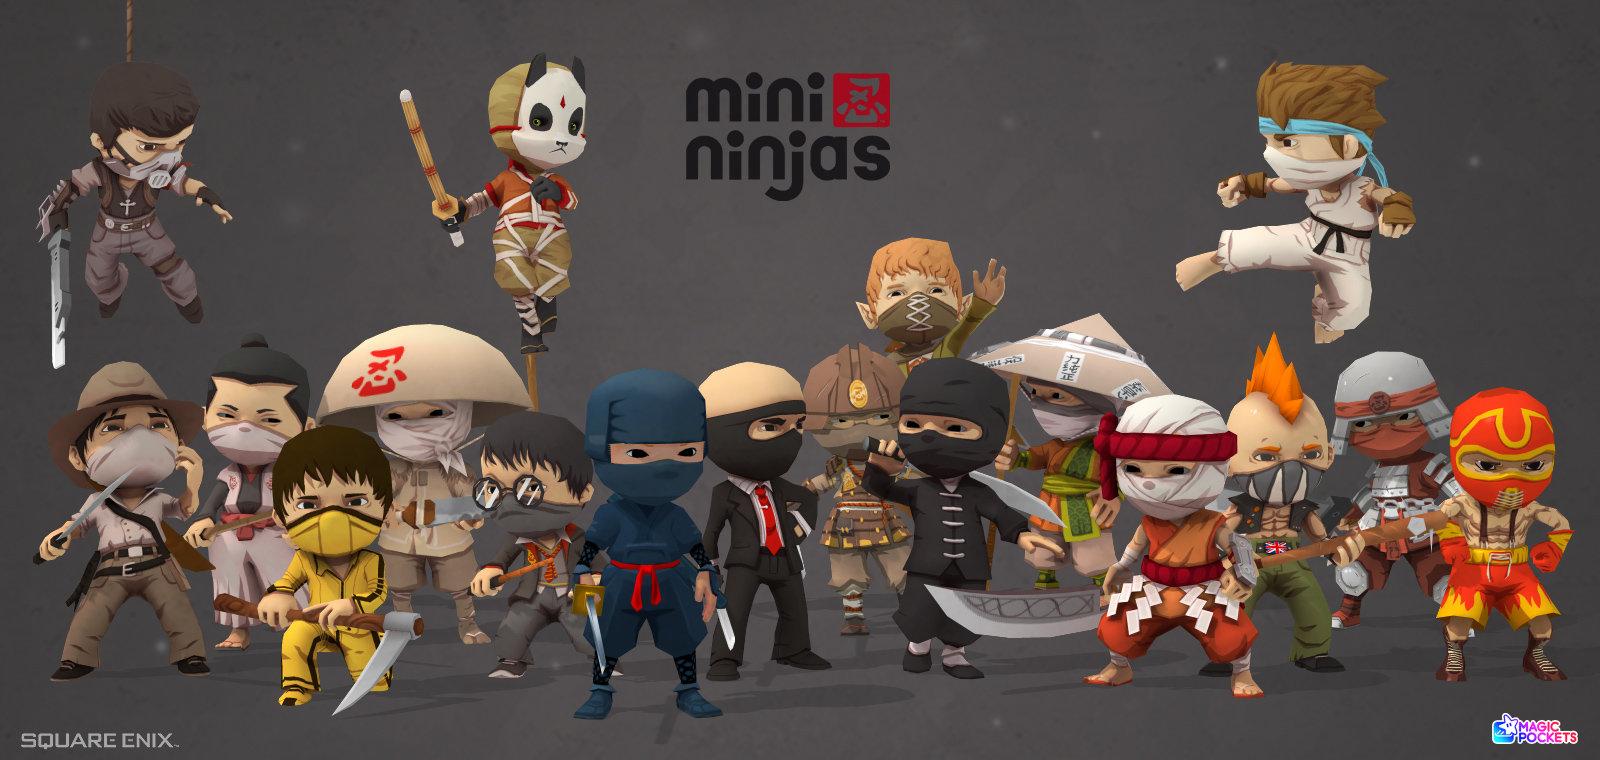 Mini Ninjas picture